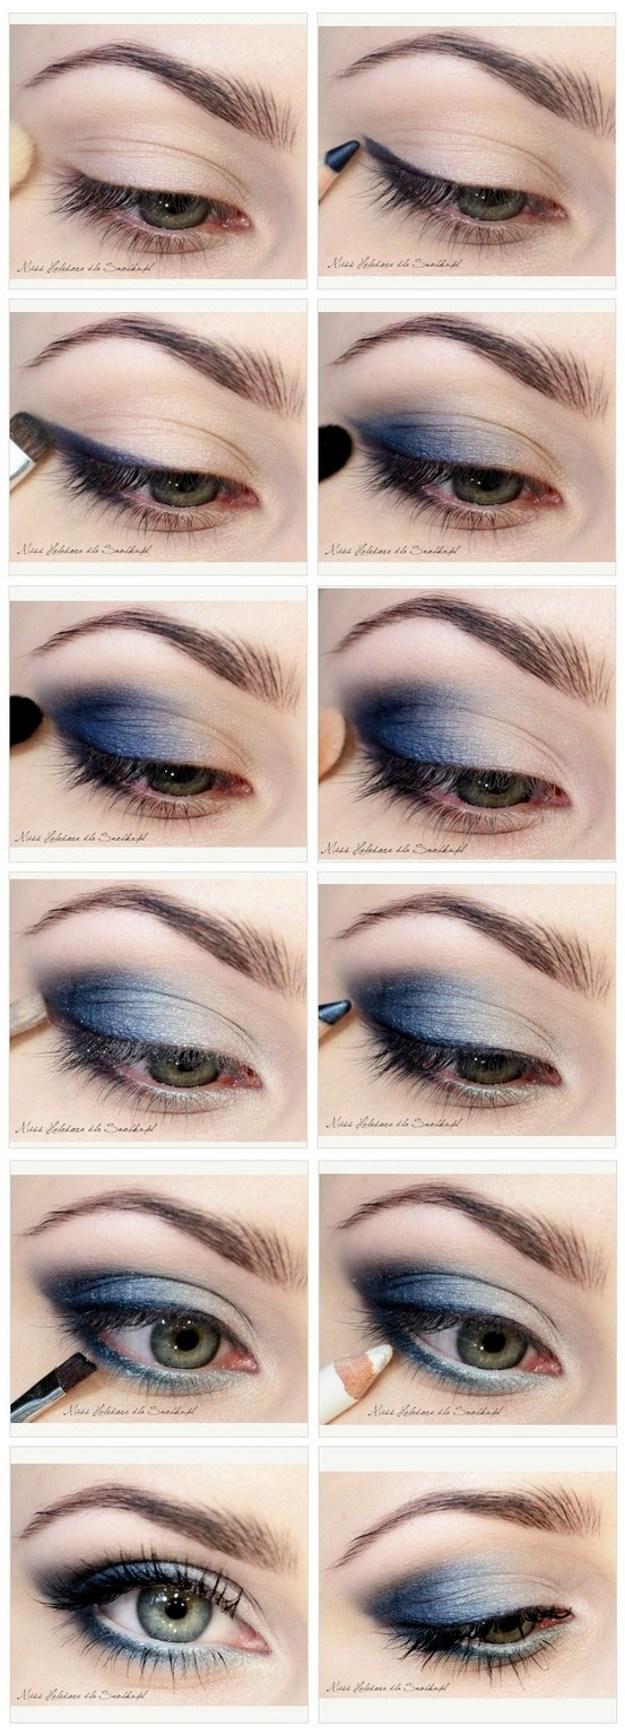 Summer chanel reflets dete de chanel makeup